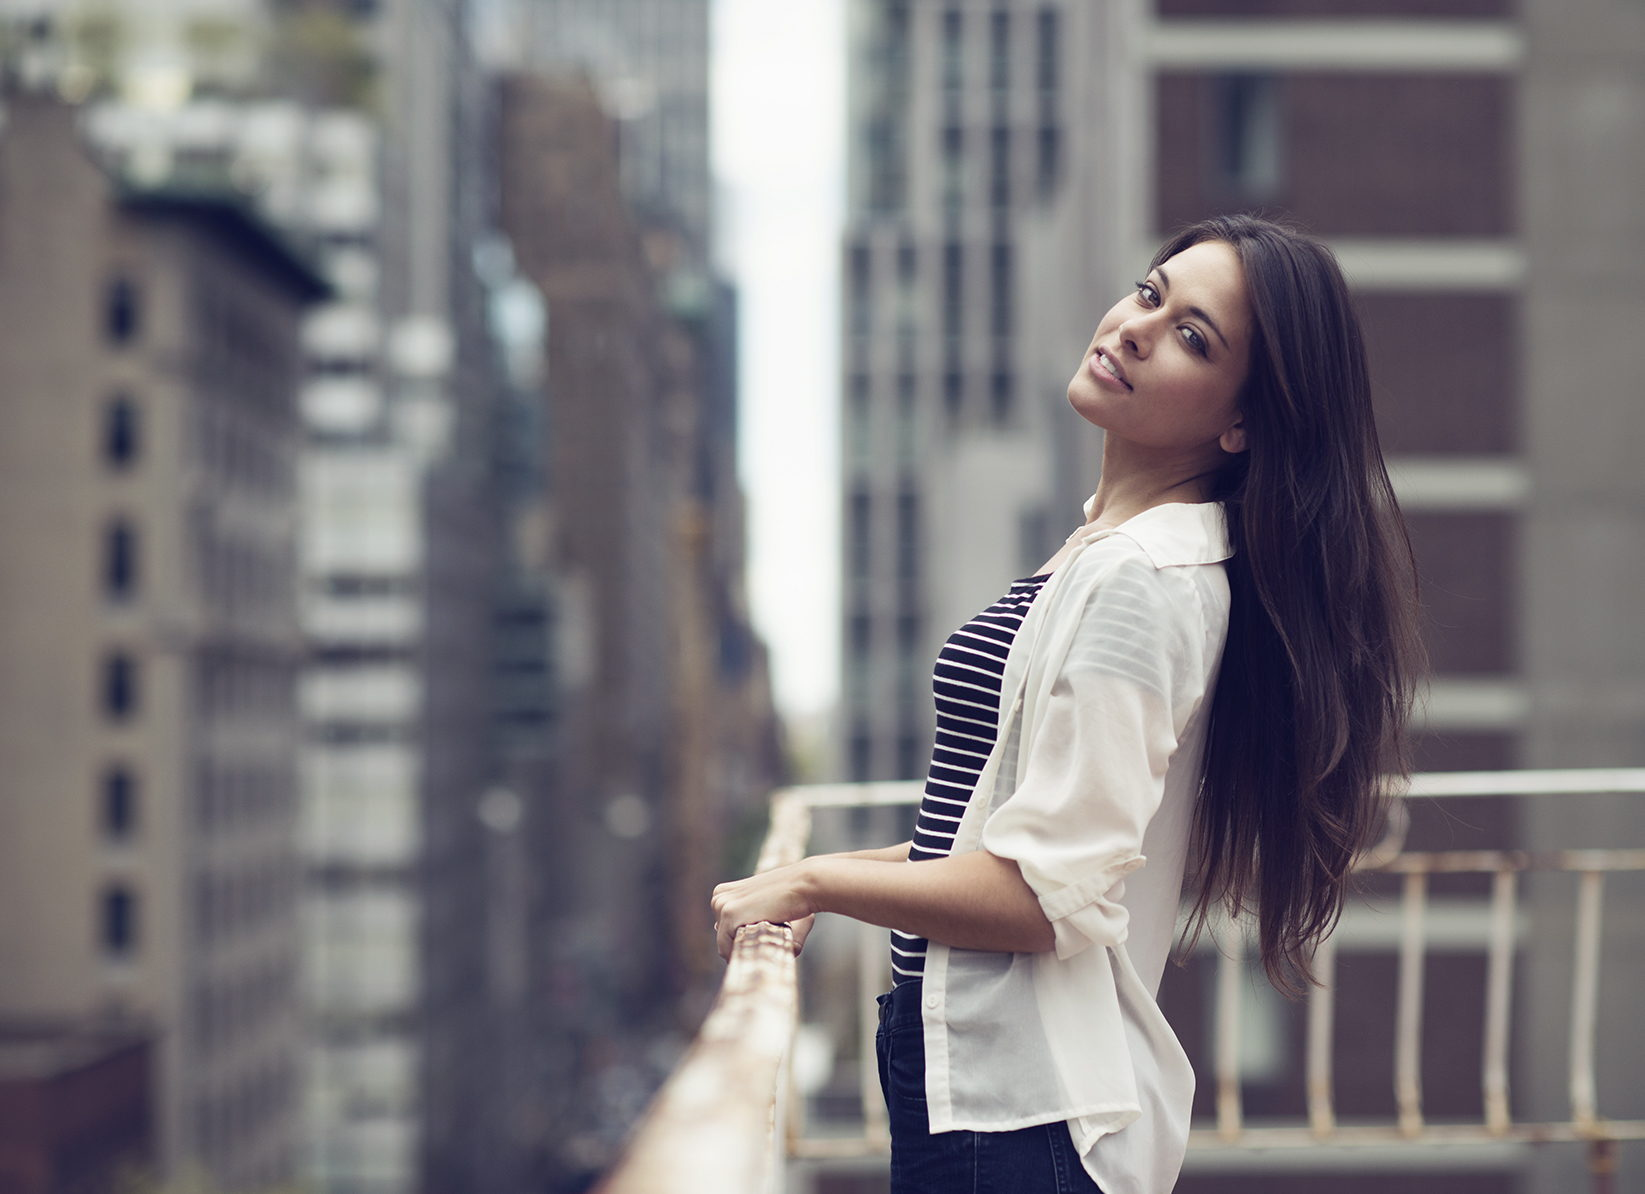 Nina - The bokeh on this 85 1.4g is insane! | portraits | Pinterest ...